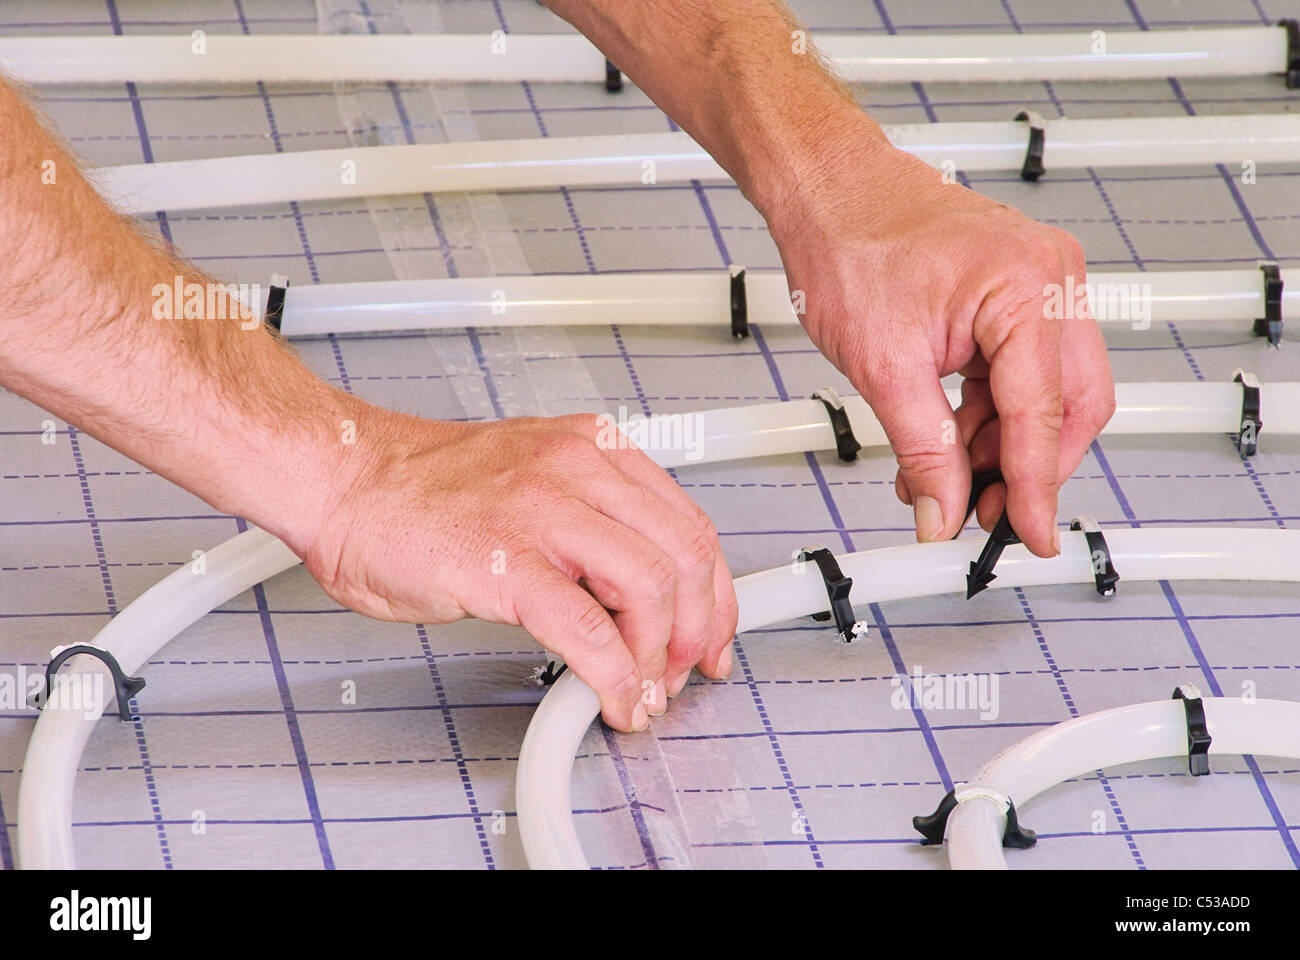 Verlegen Fußbodenheizung fussbodenheizung verlegen install slab heating 01 stock